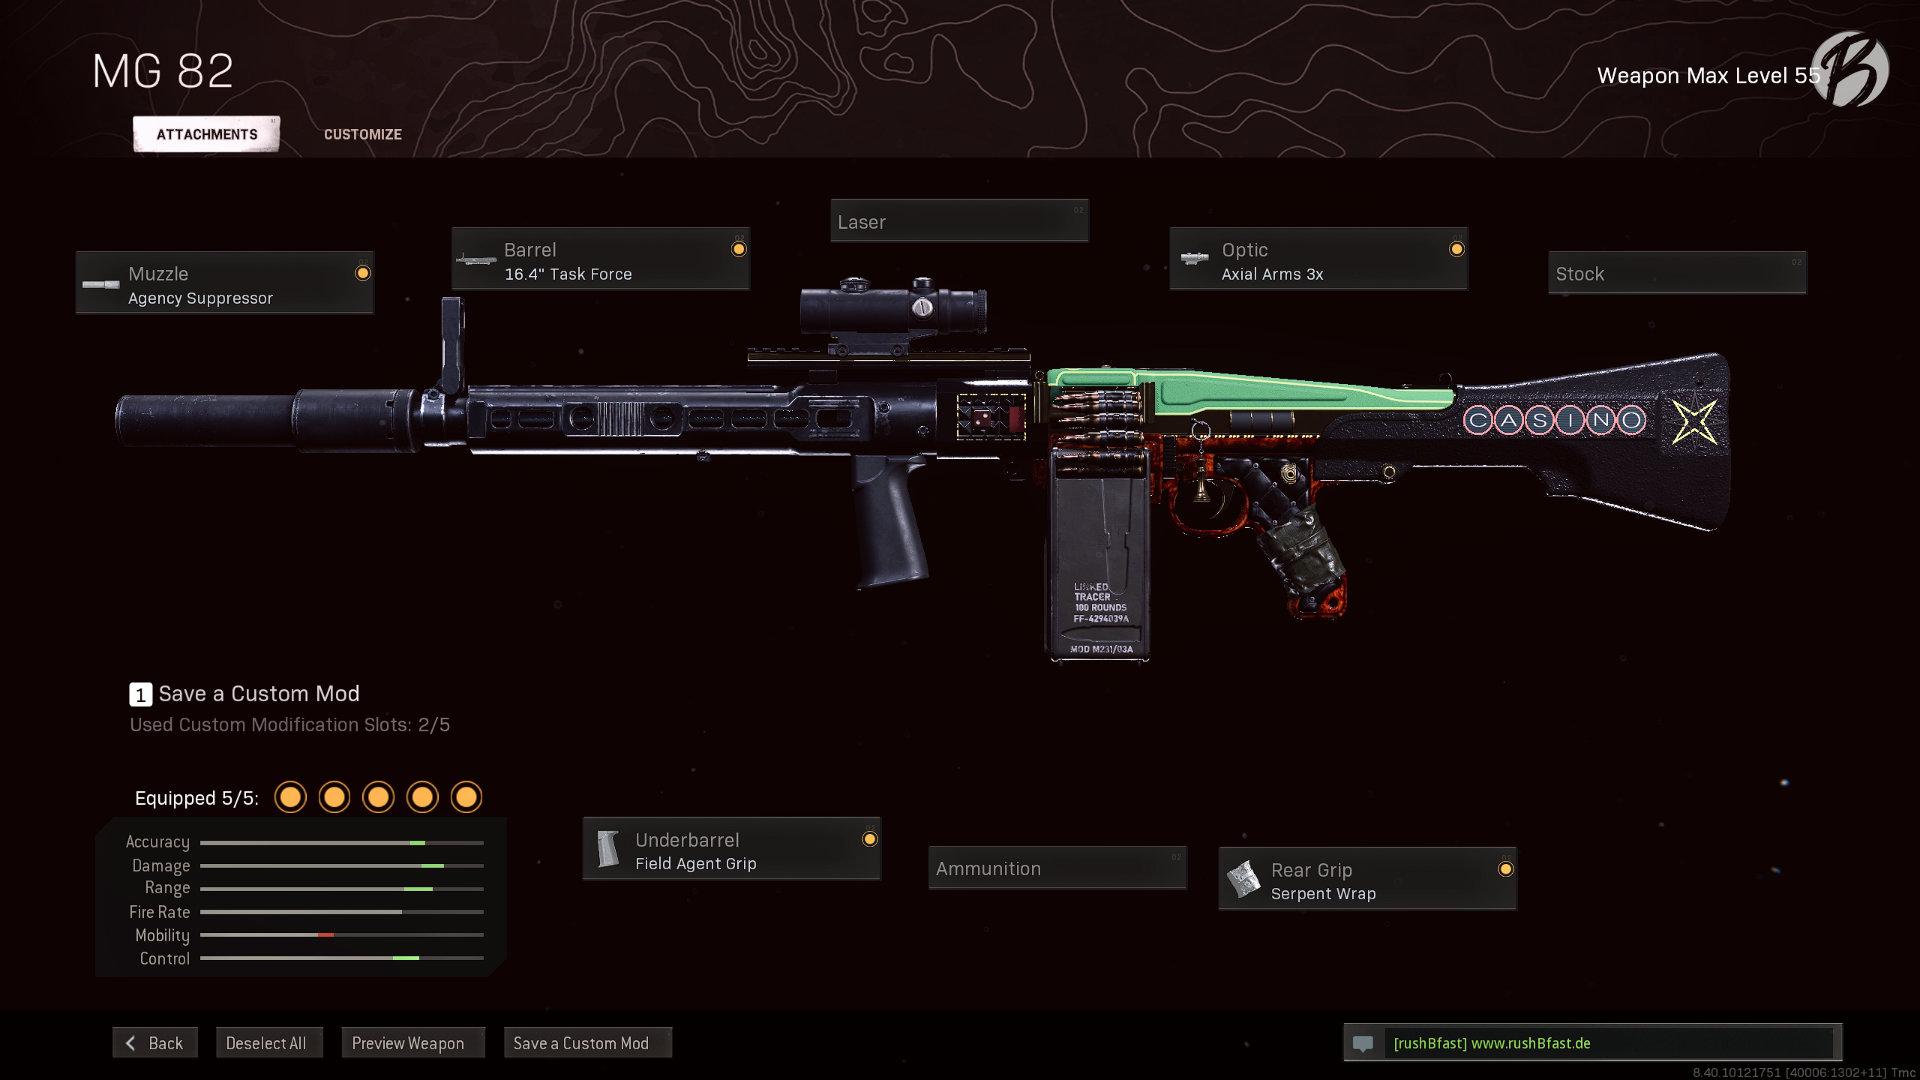 Call of Duty Warzone - Cold War Season 5 - MG 82 (englisch)